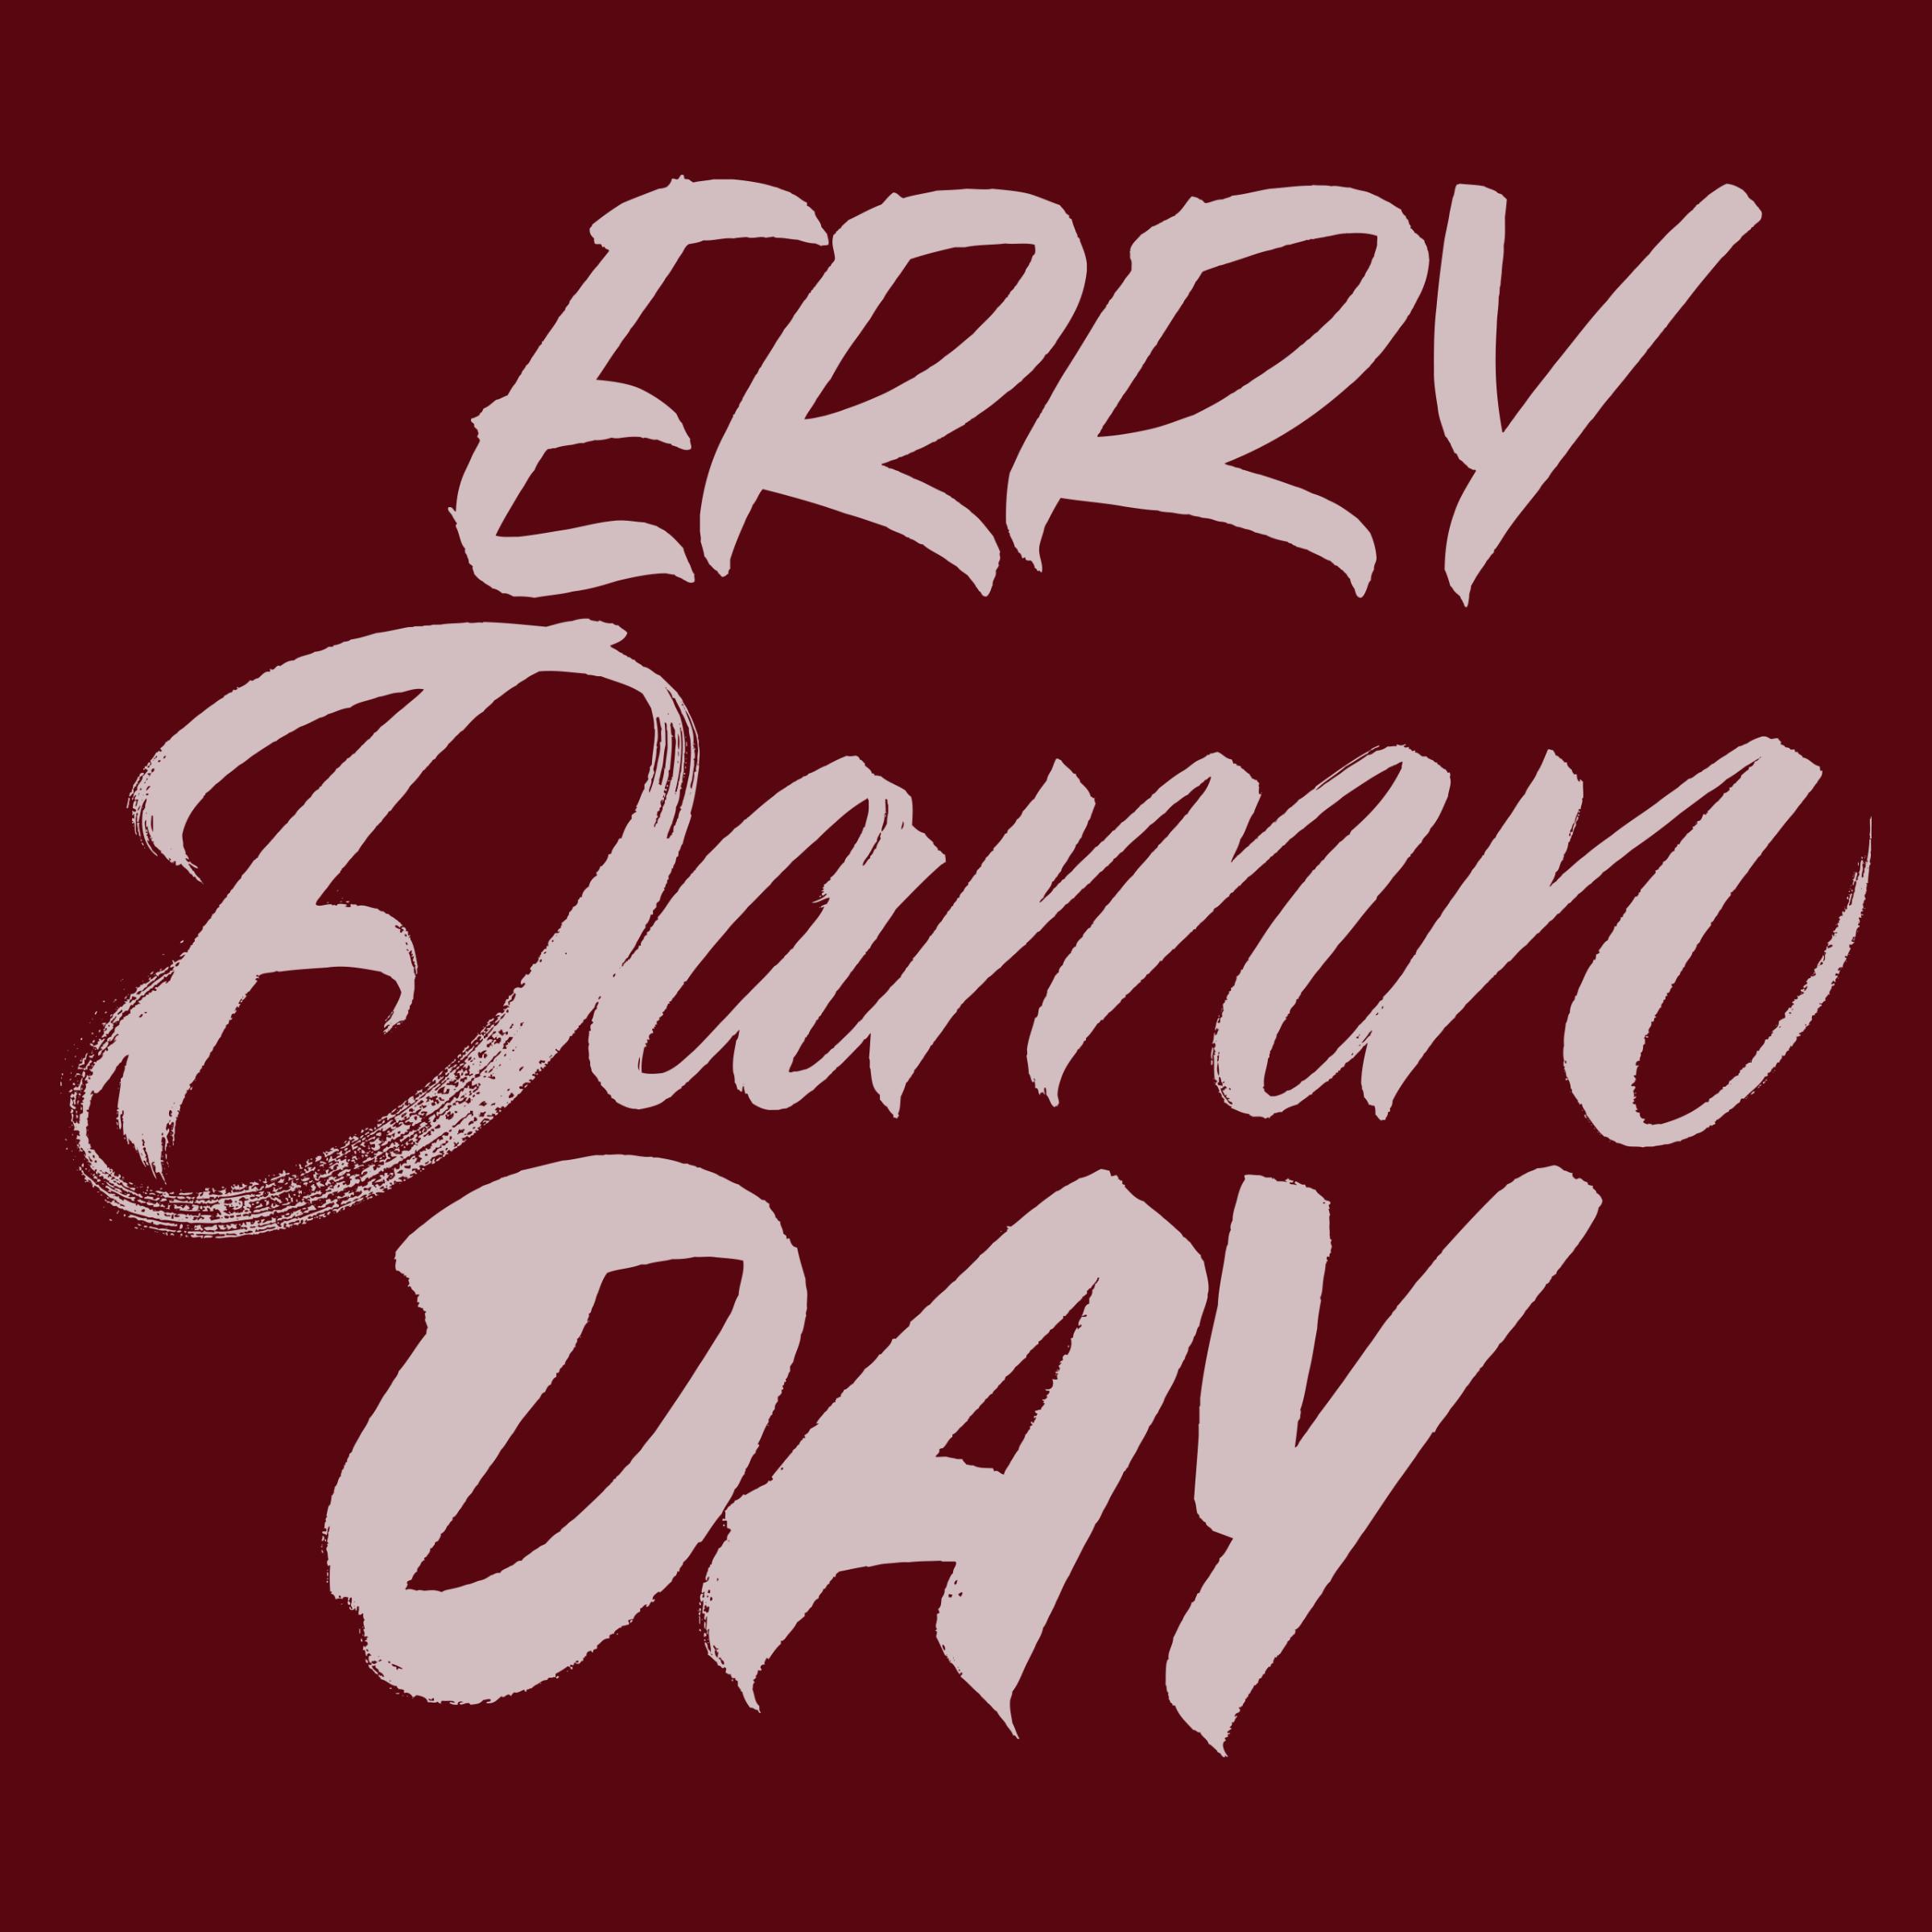 Erry. Damn. Day.